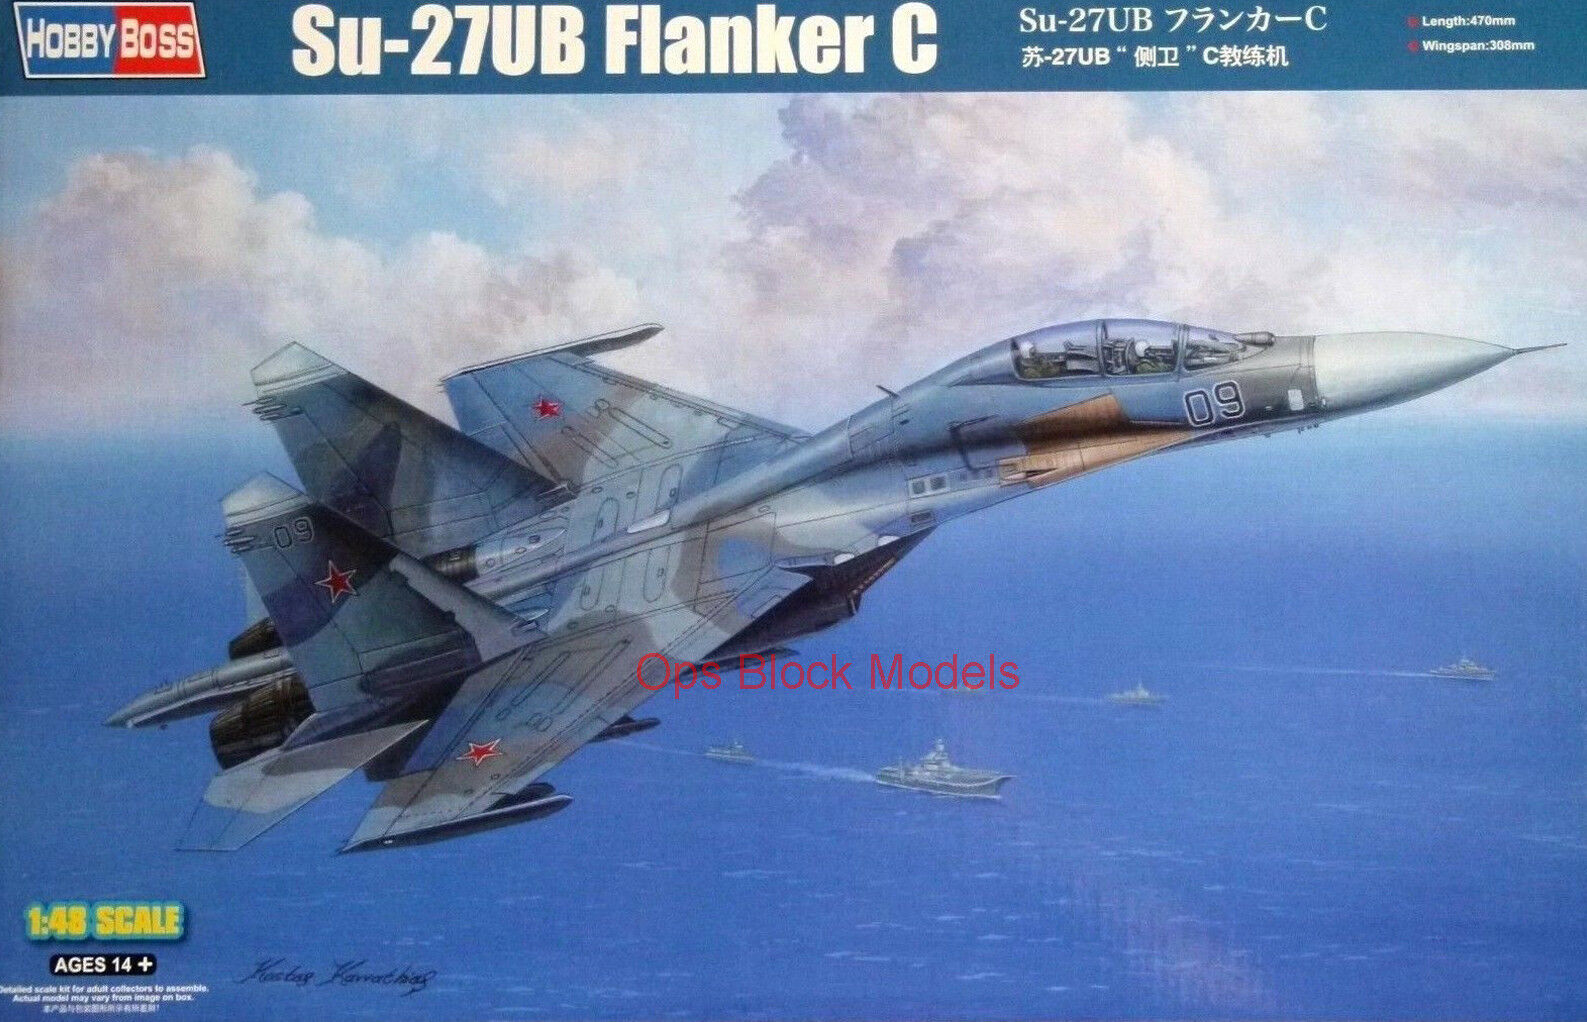 HOBBYBOSS 1 48 SUKHOI Su-27UB FLANKER C